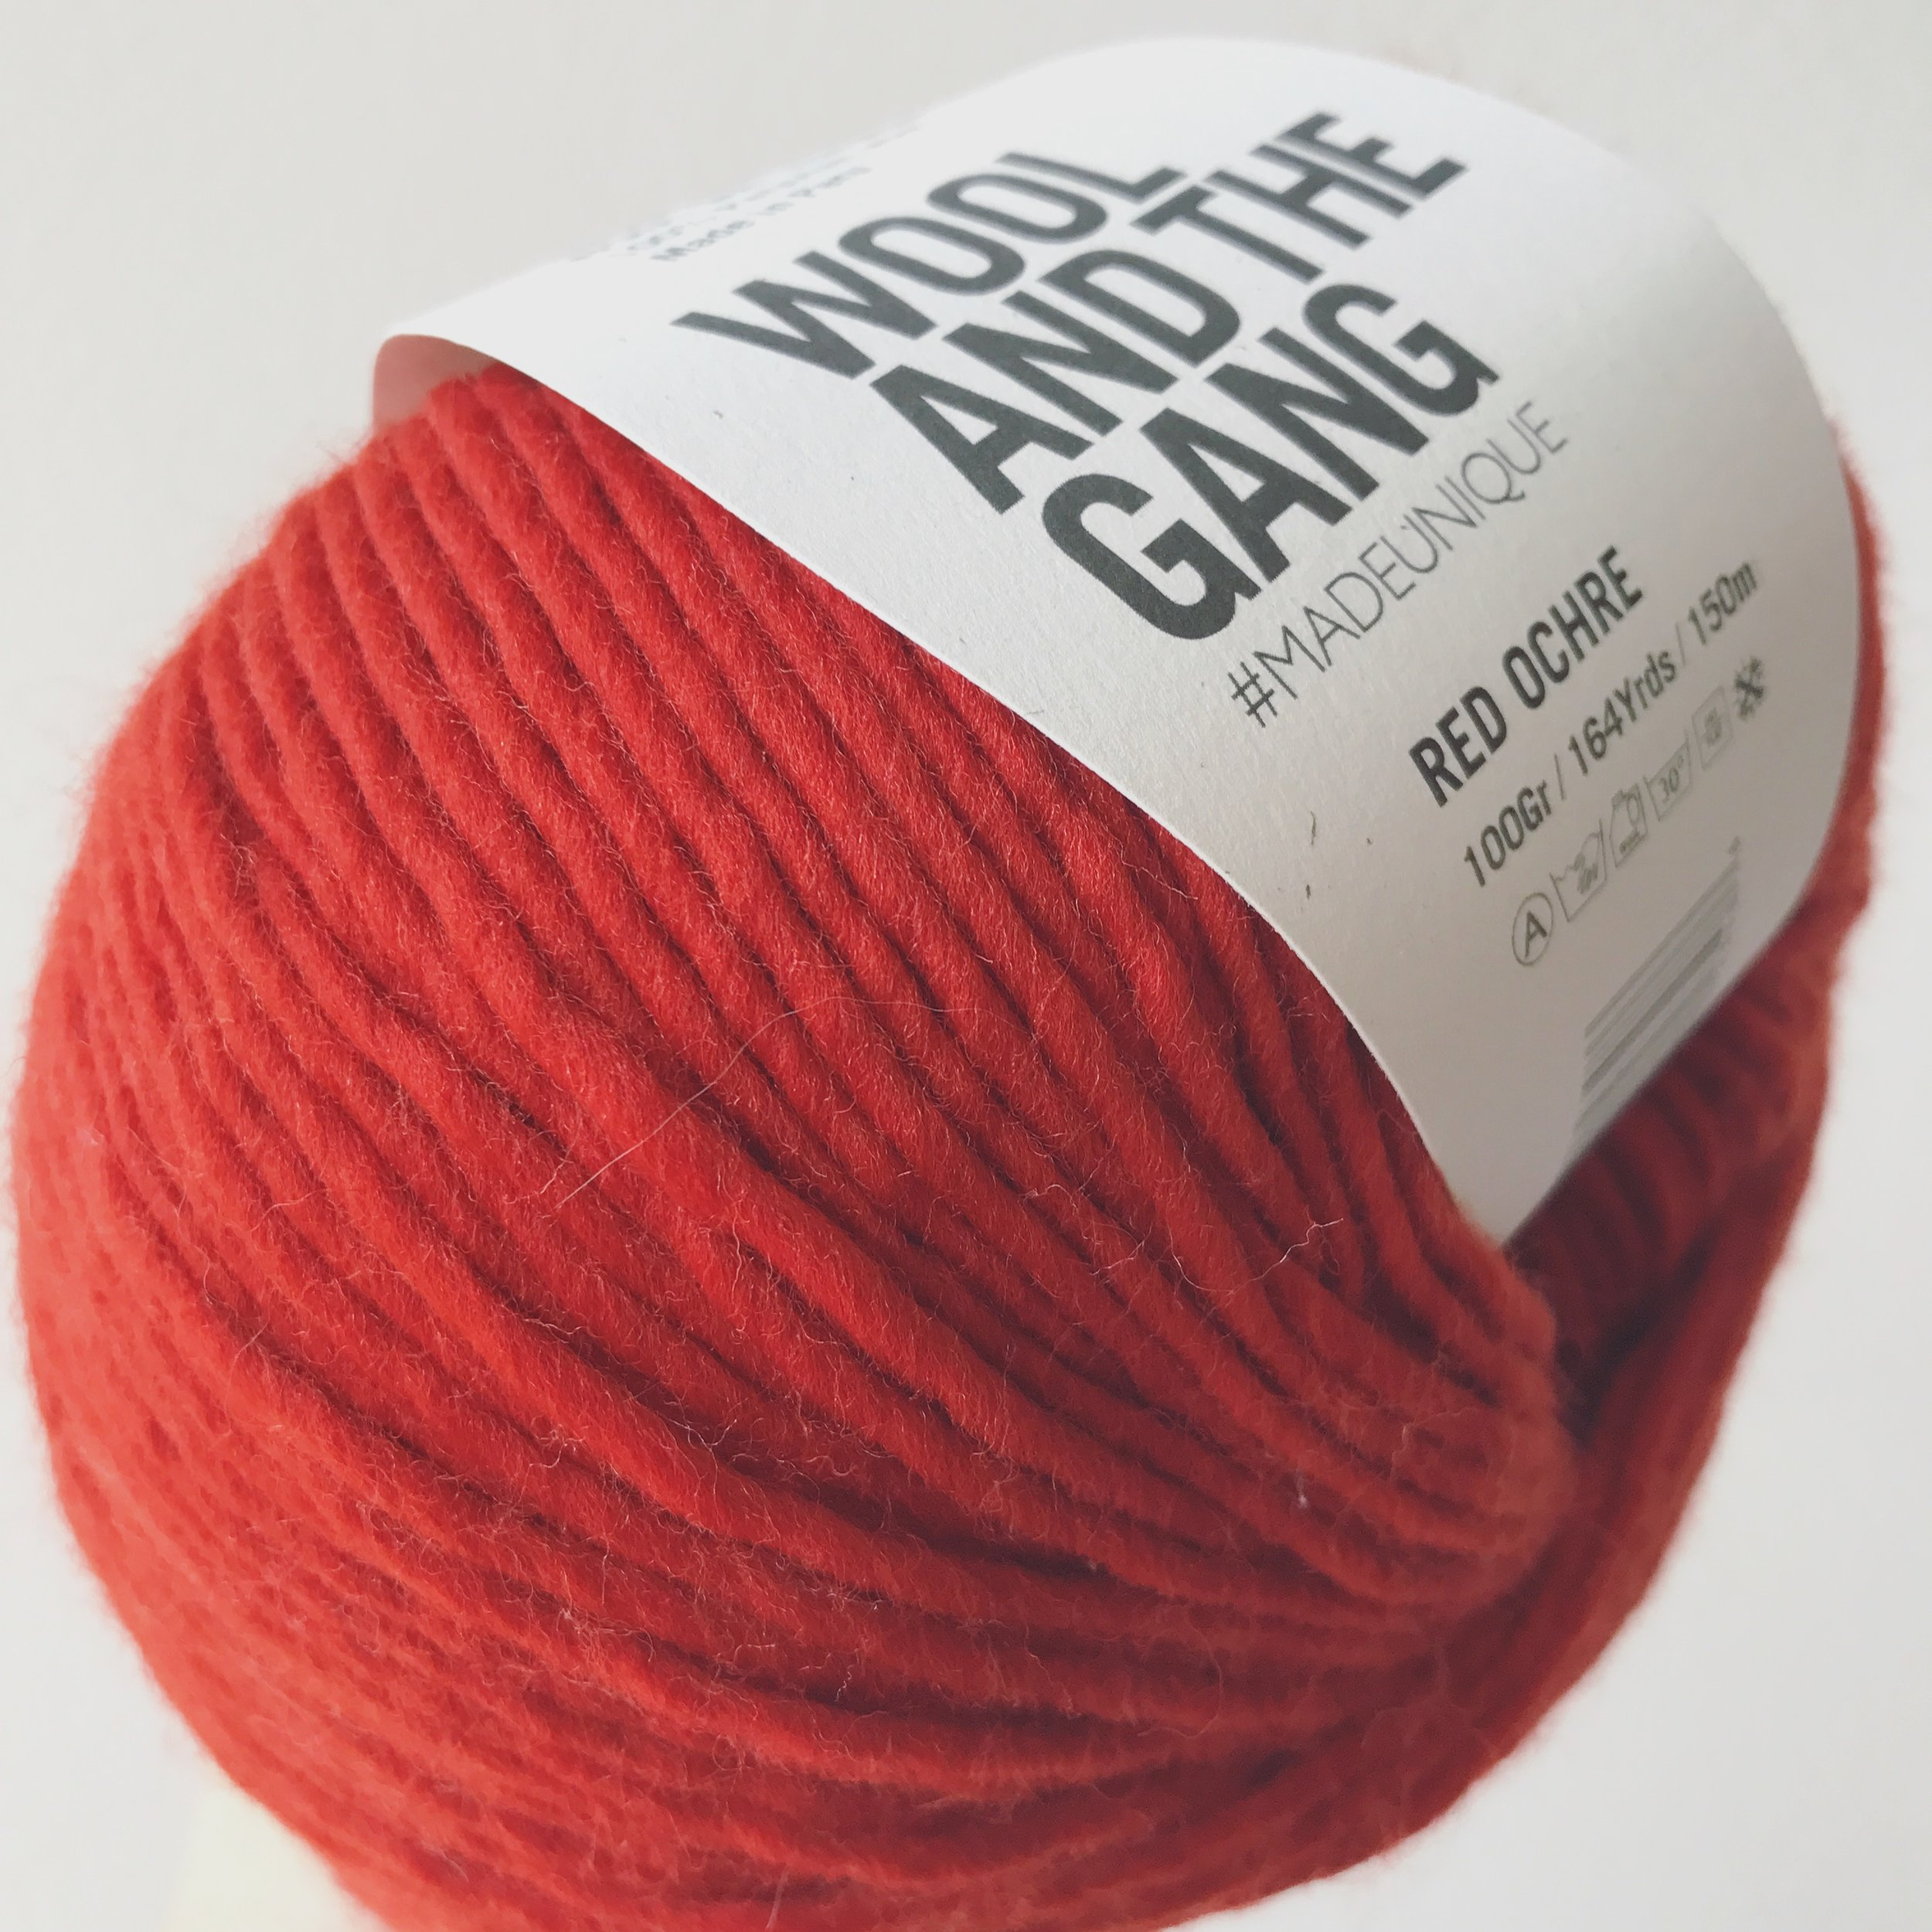 Wool & the Gang, Wool Me Tender, Red Ochre Image © Firefly Fiber Arts Studio